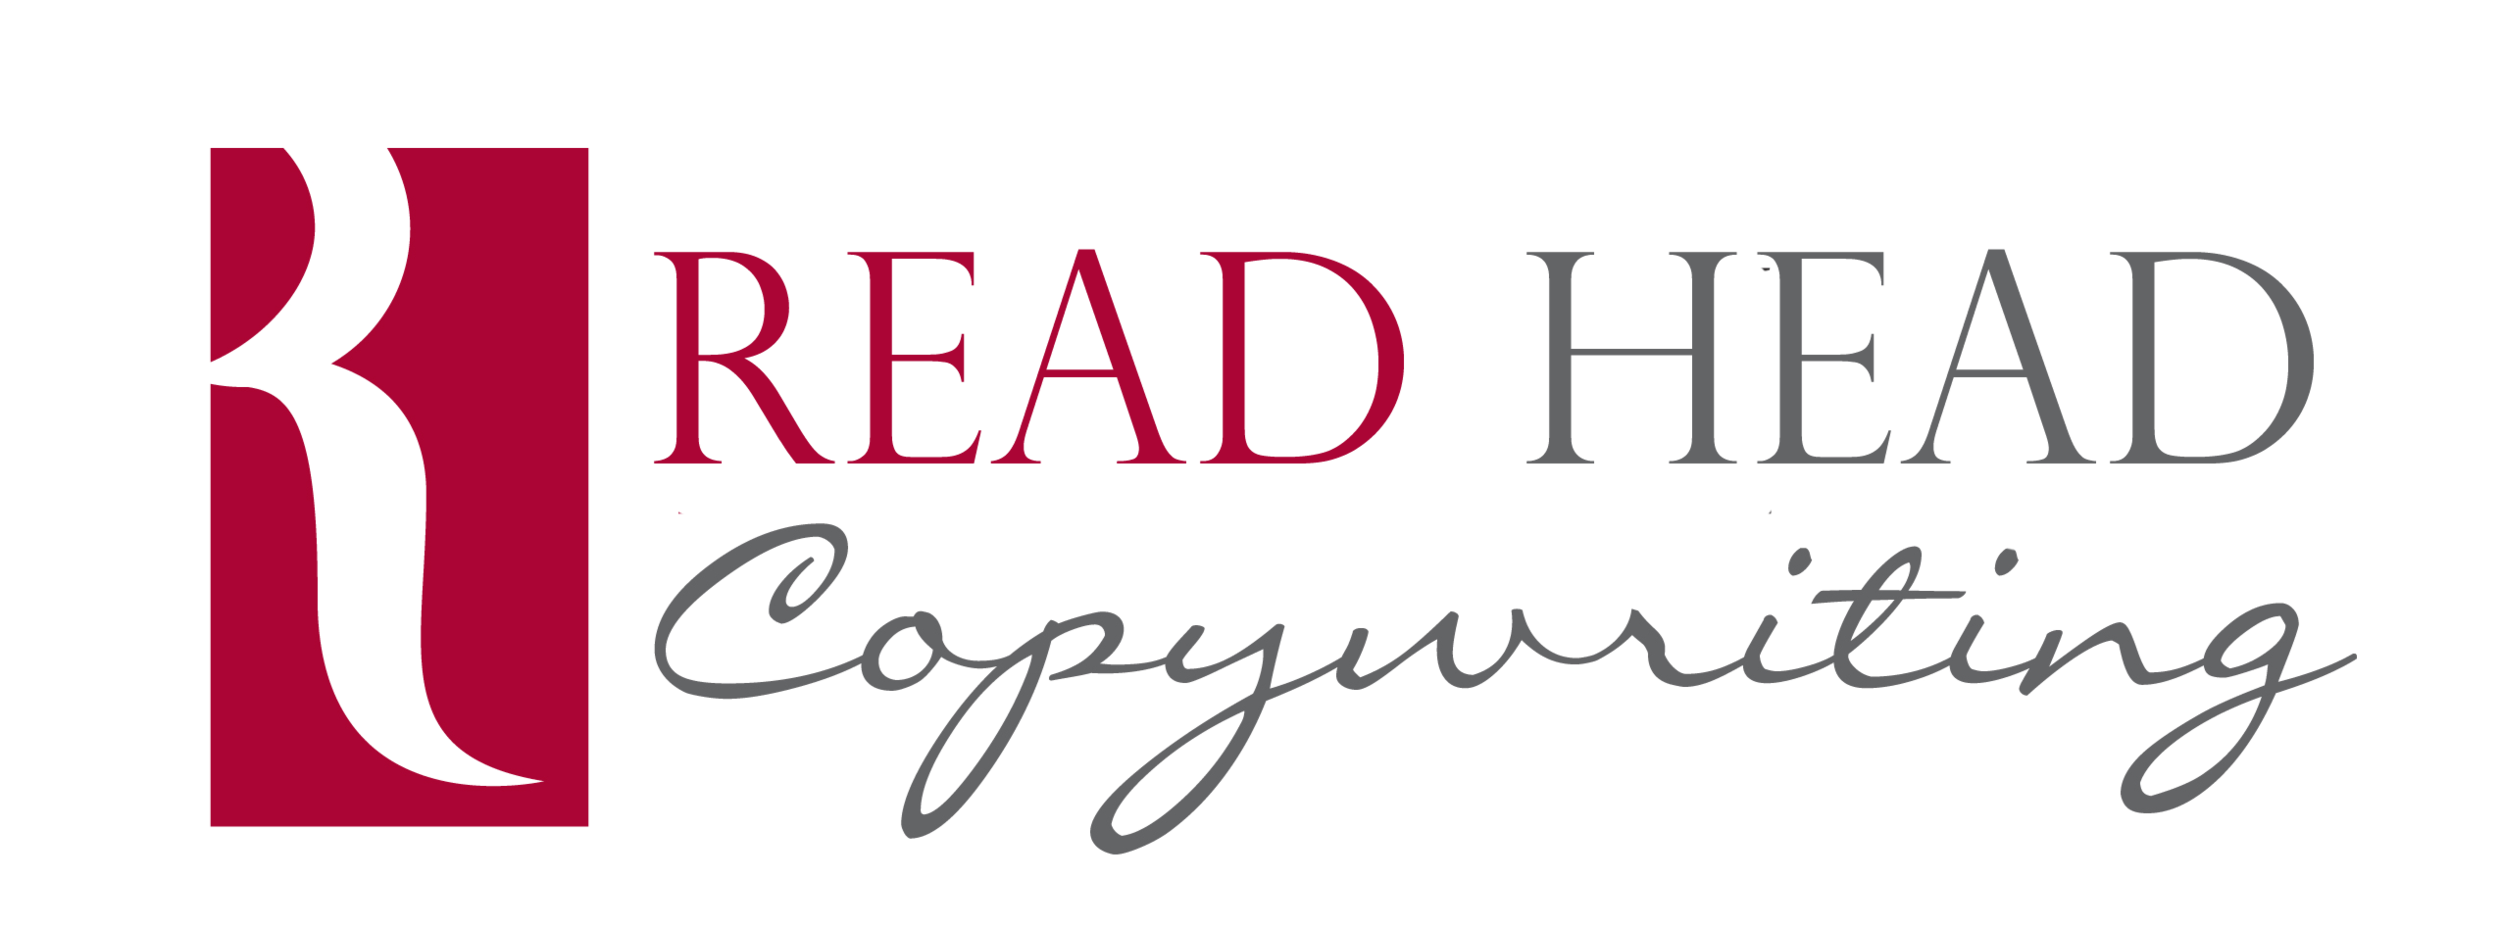 RHC_logo_FINAL.png